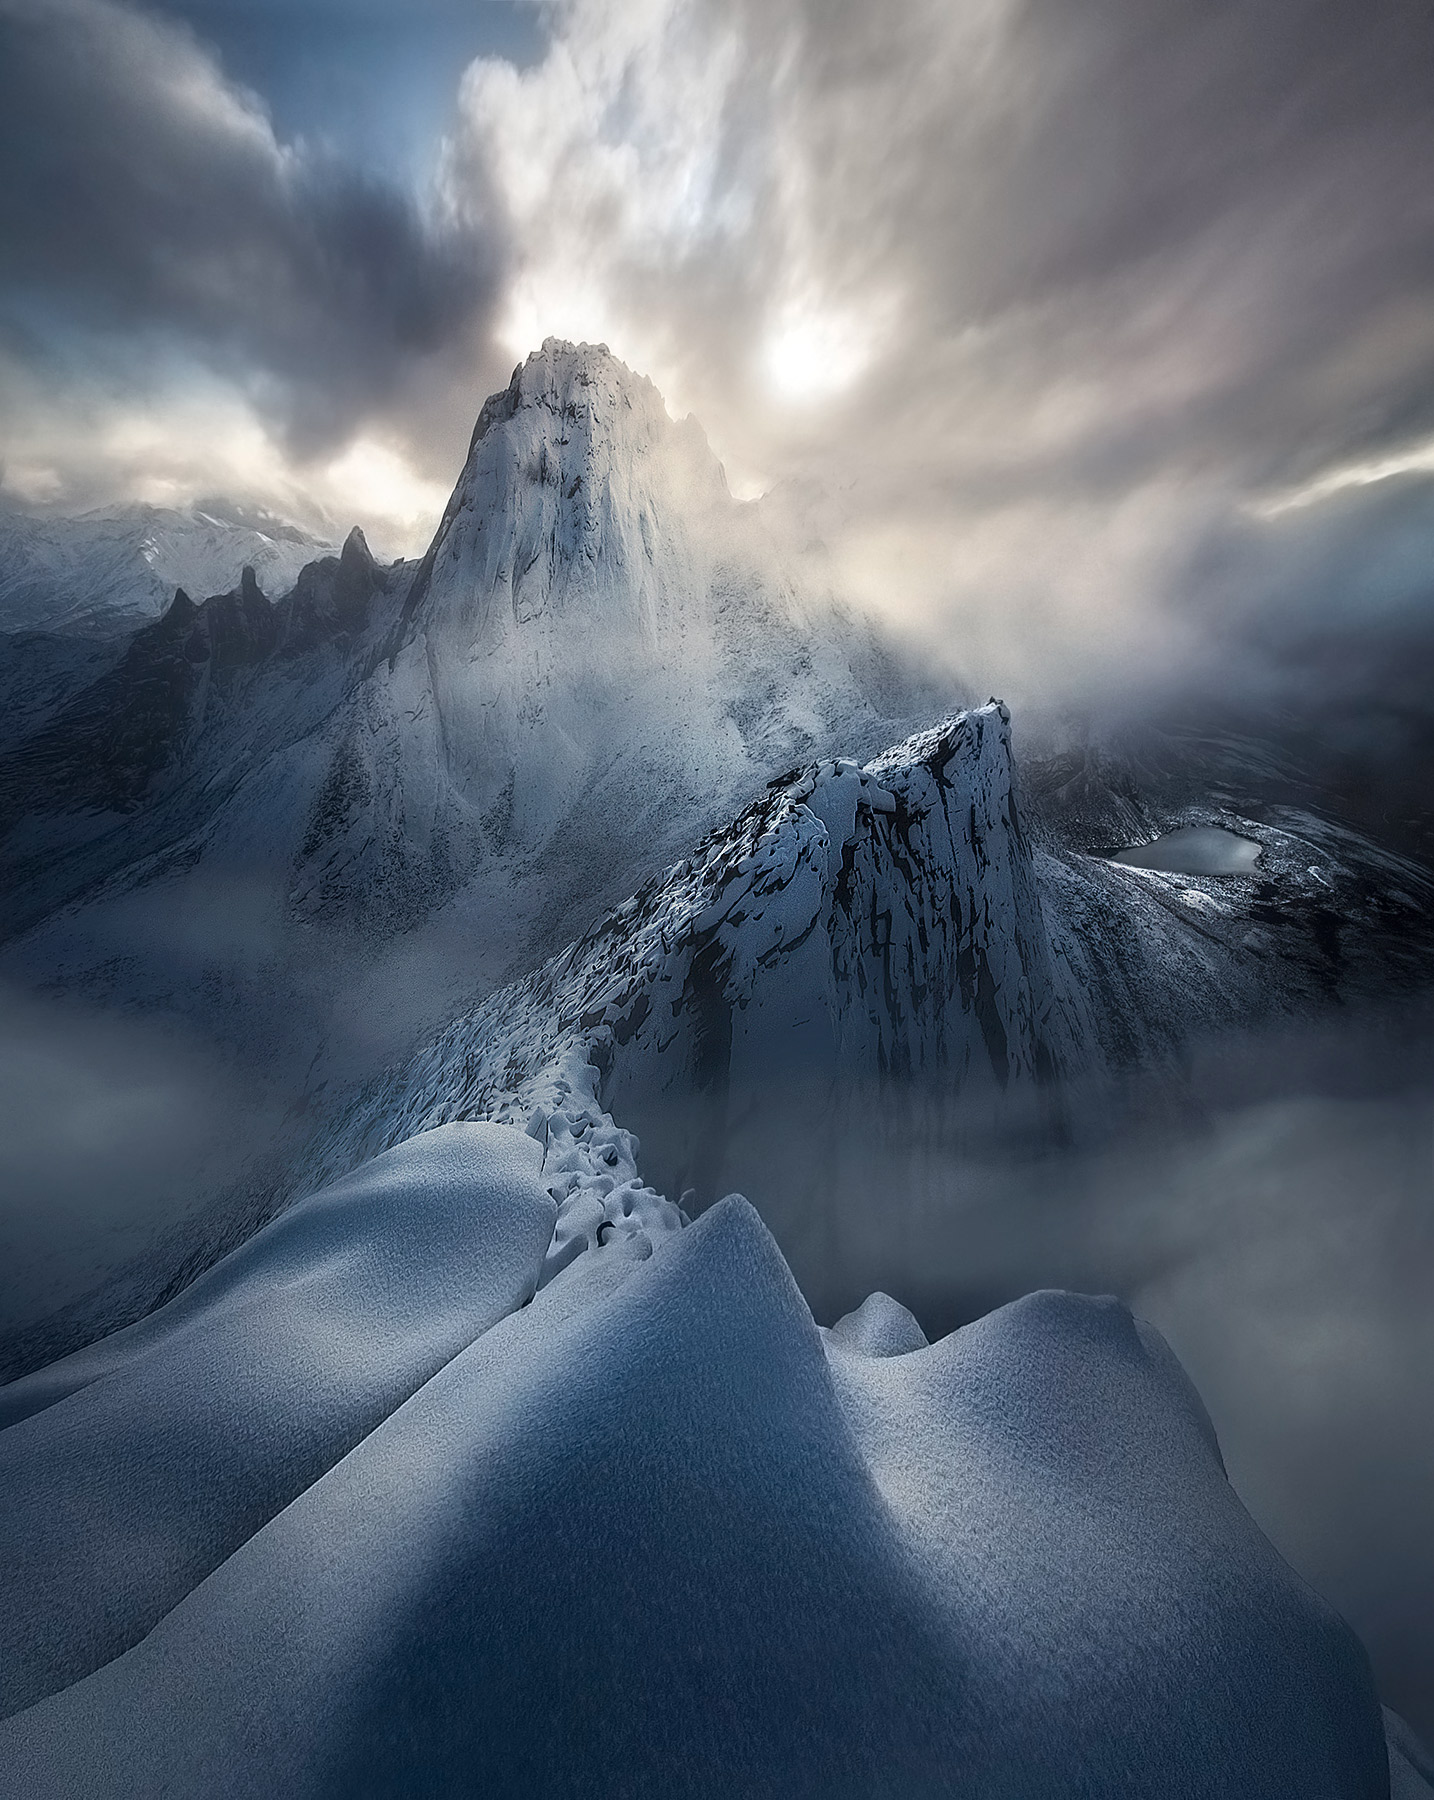 yukon snow ridge climbing mountaineering tombstone, photo